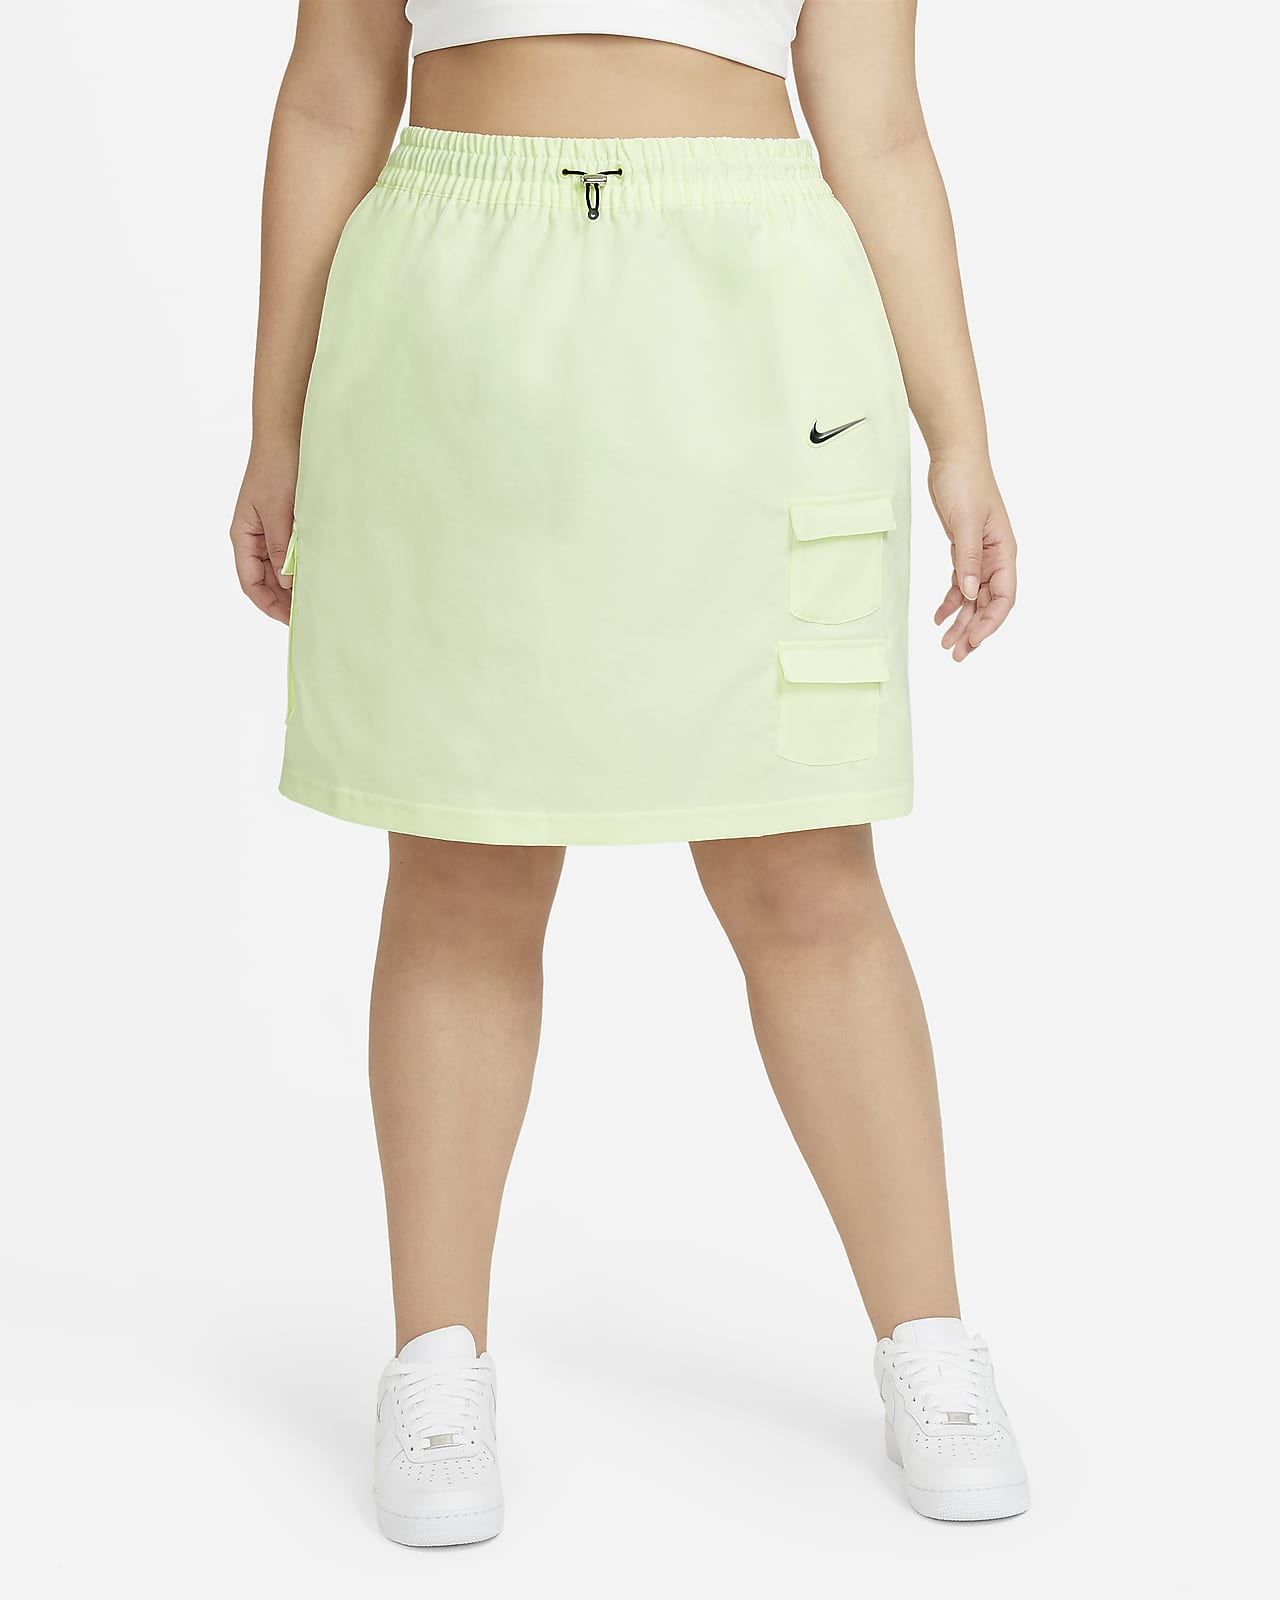 Nike Sportswear Swoosh Faldilla (talles grans) - Dona